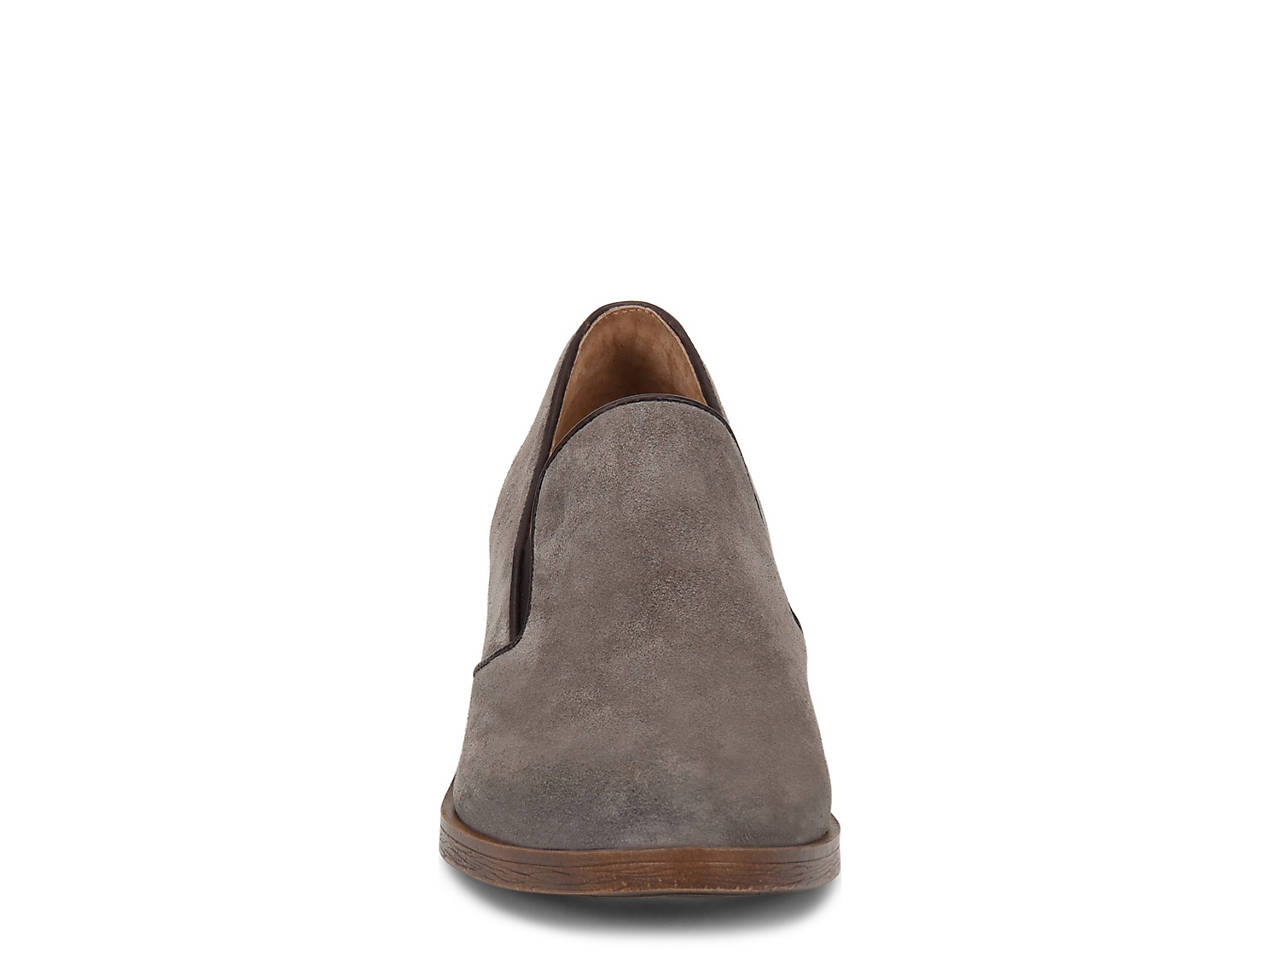 cbdf2f4f70c Sofft Velina Loafer Women s Shoes